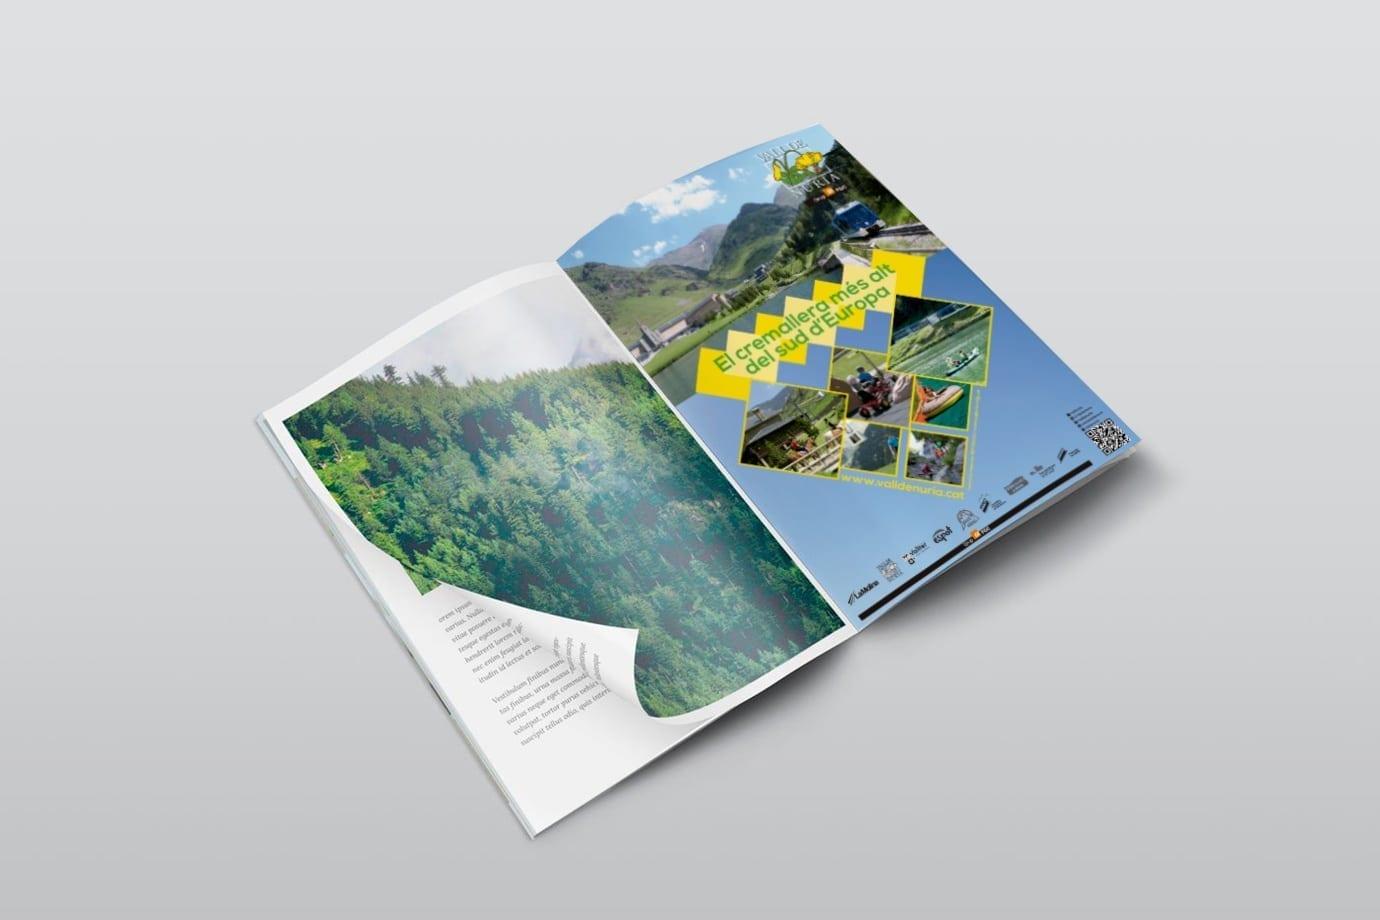 isometric-magazine-mockup-2-images-Recuperado